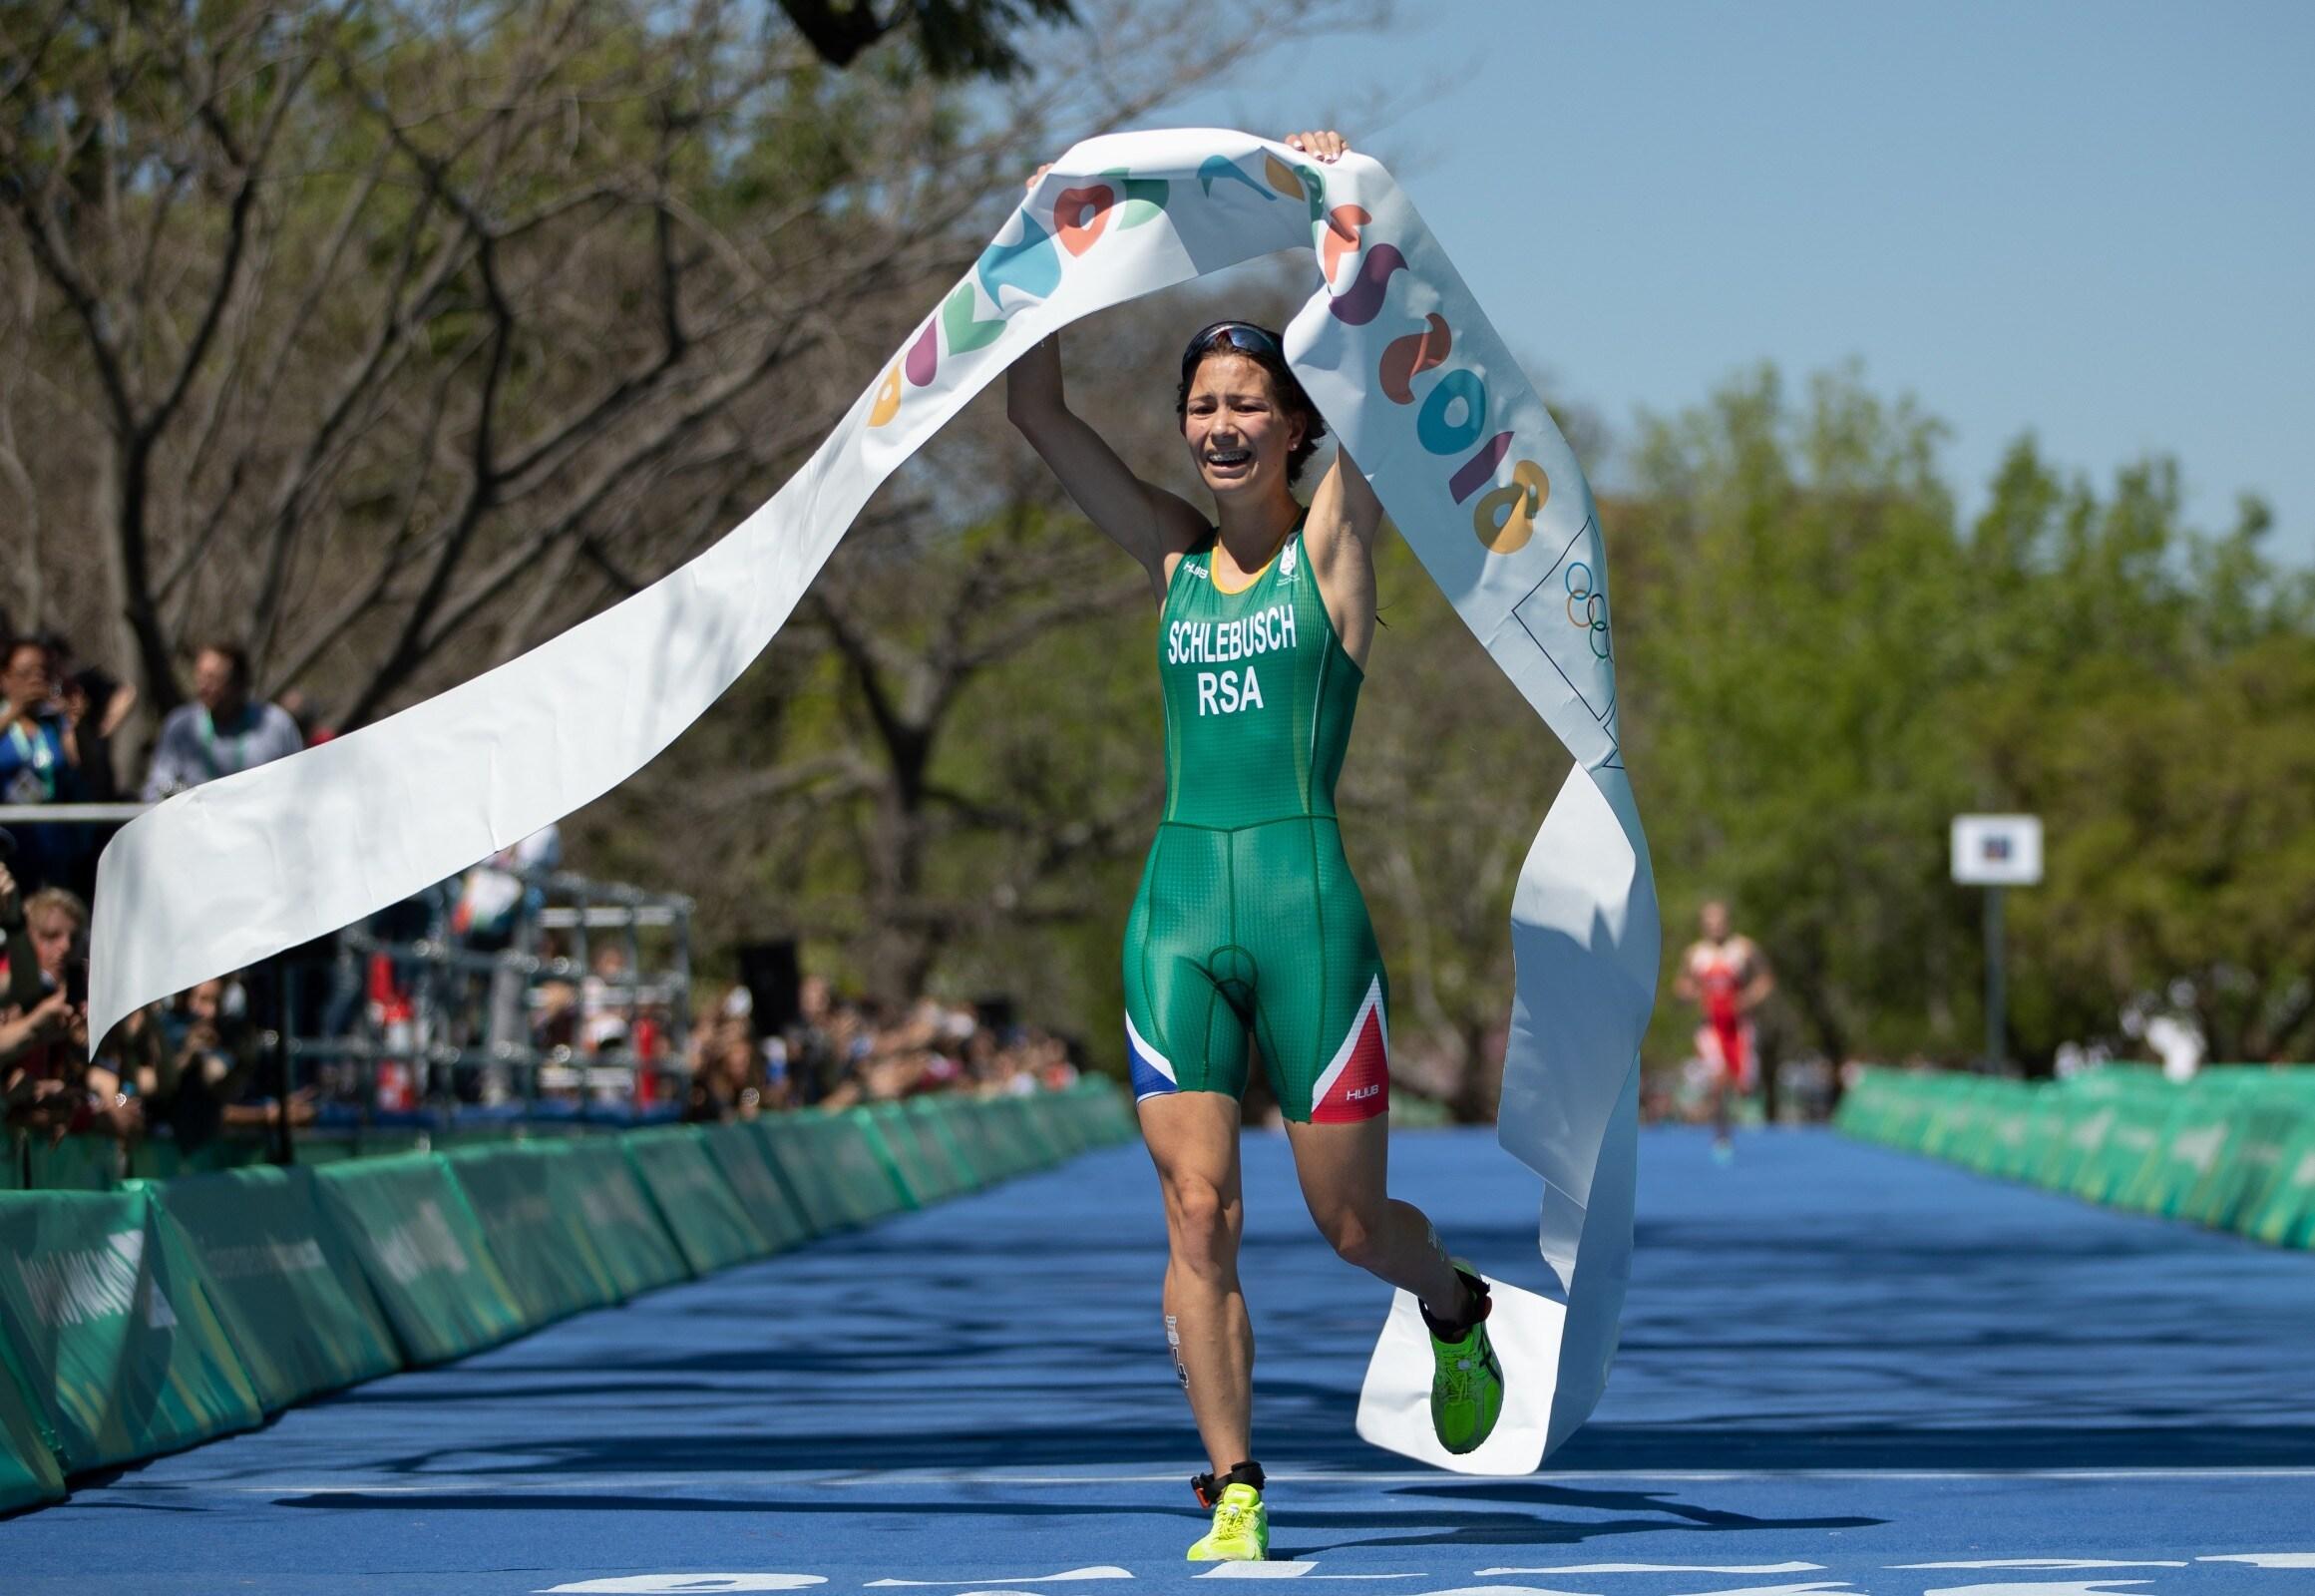 Buenos Aires 2018 - Triathlon